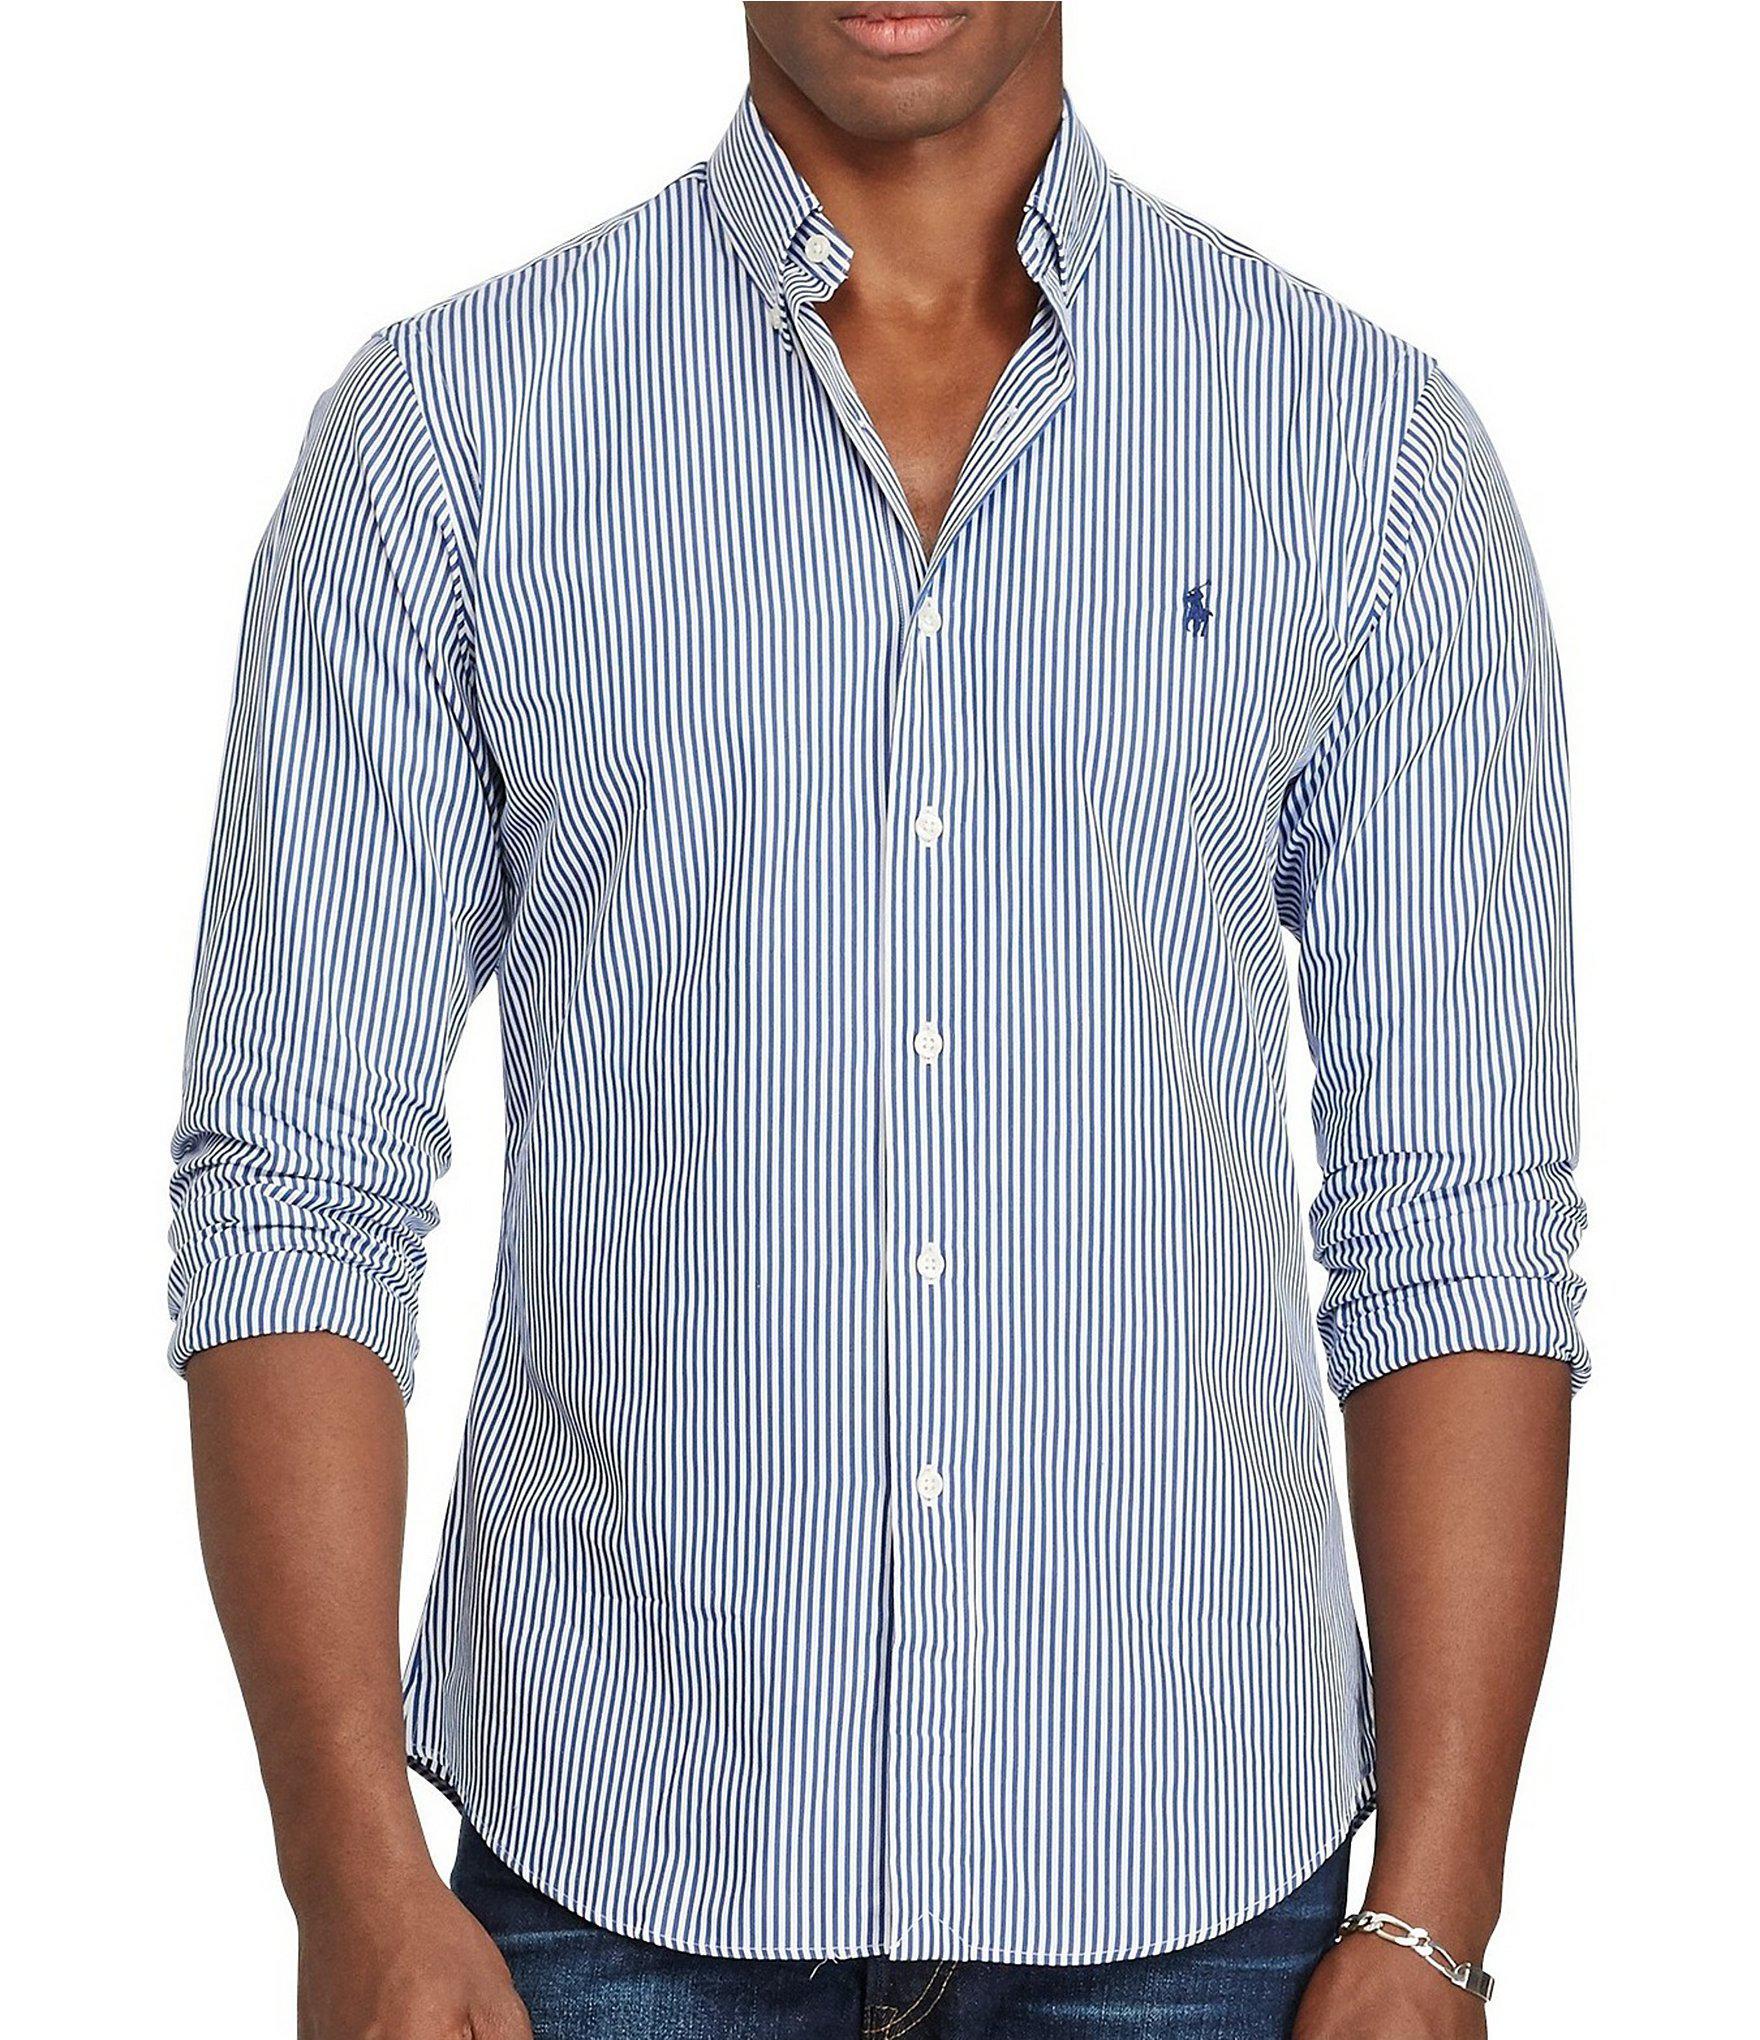 e438fda7b Polo Ralph Lauren Slim-fit Vertical Striped Poplin Long-sleeve Woven ...